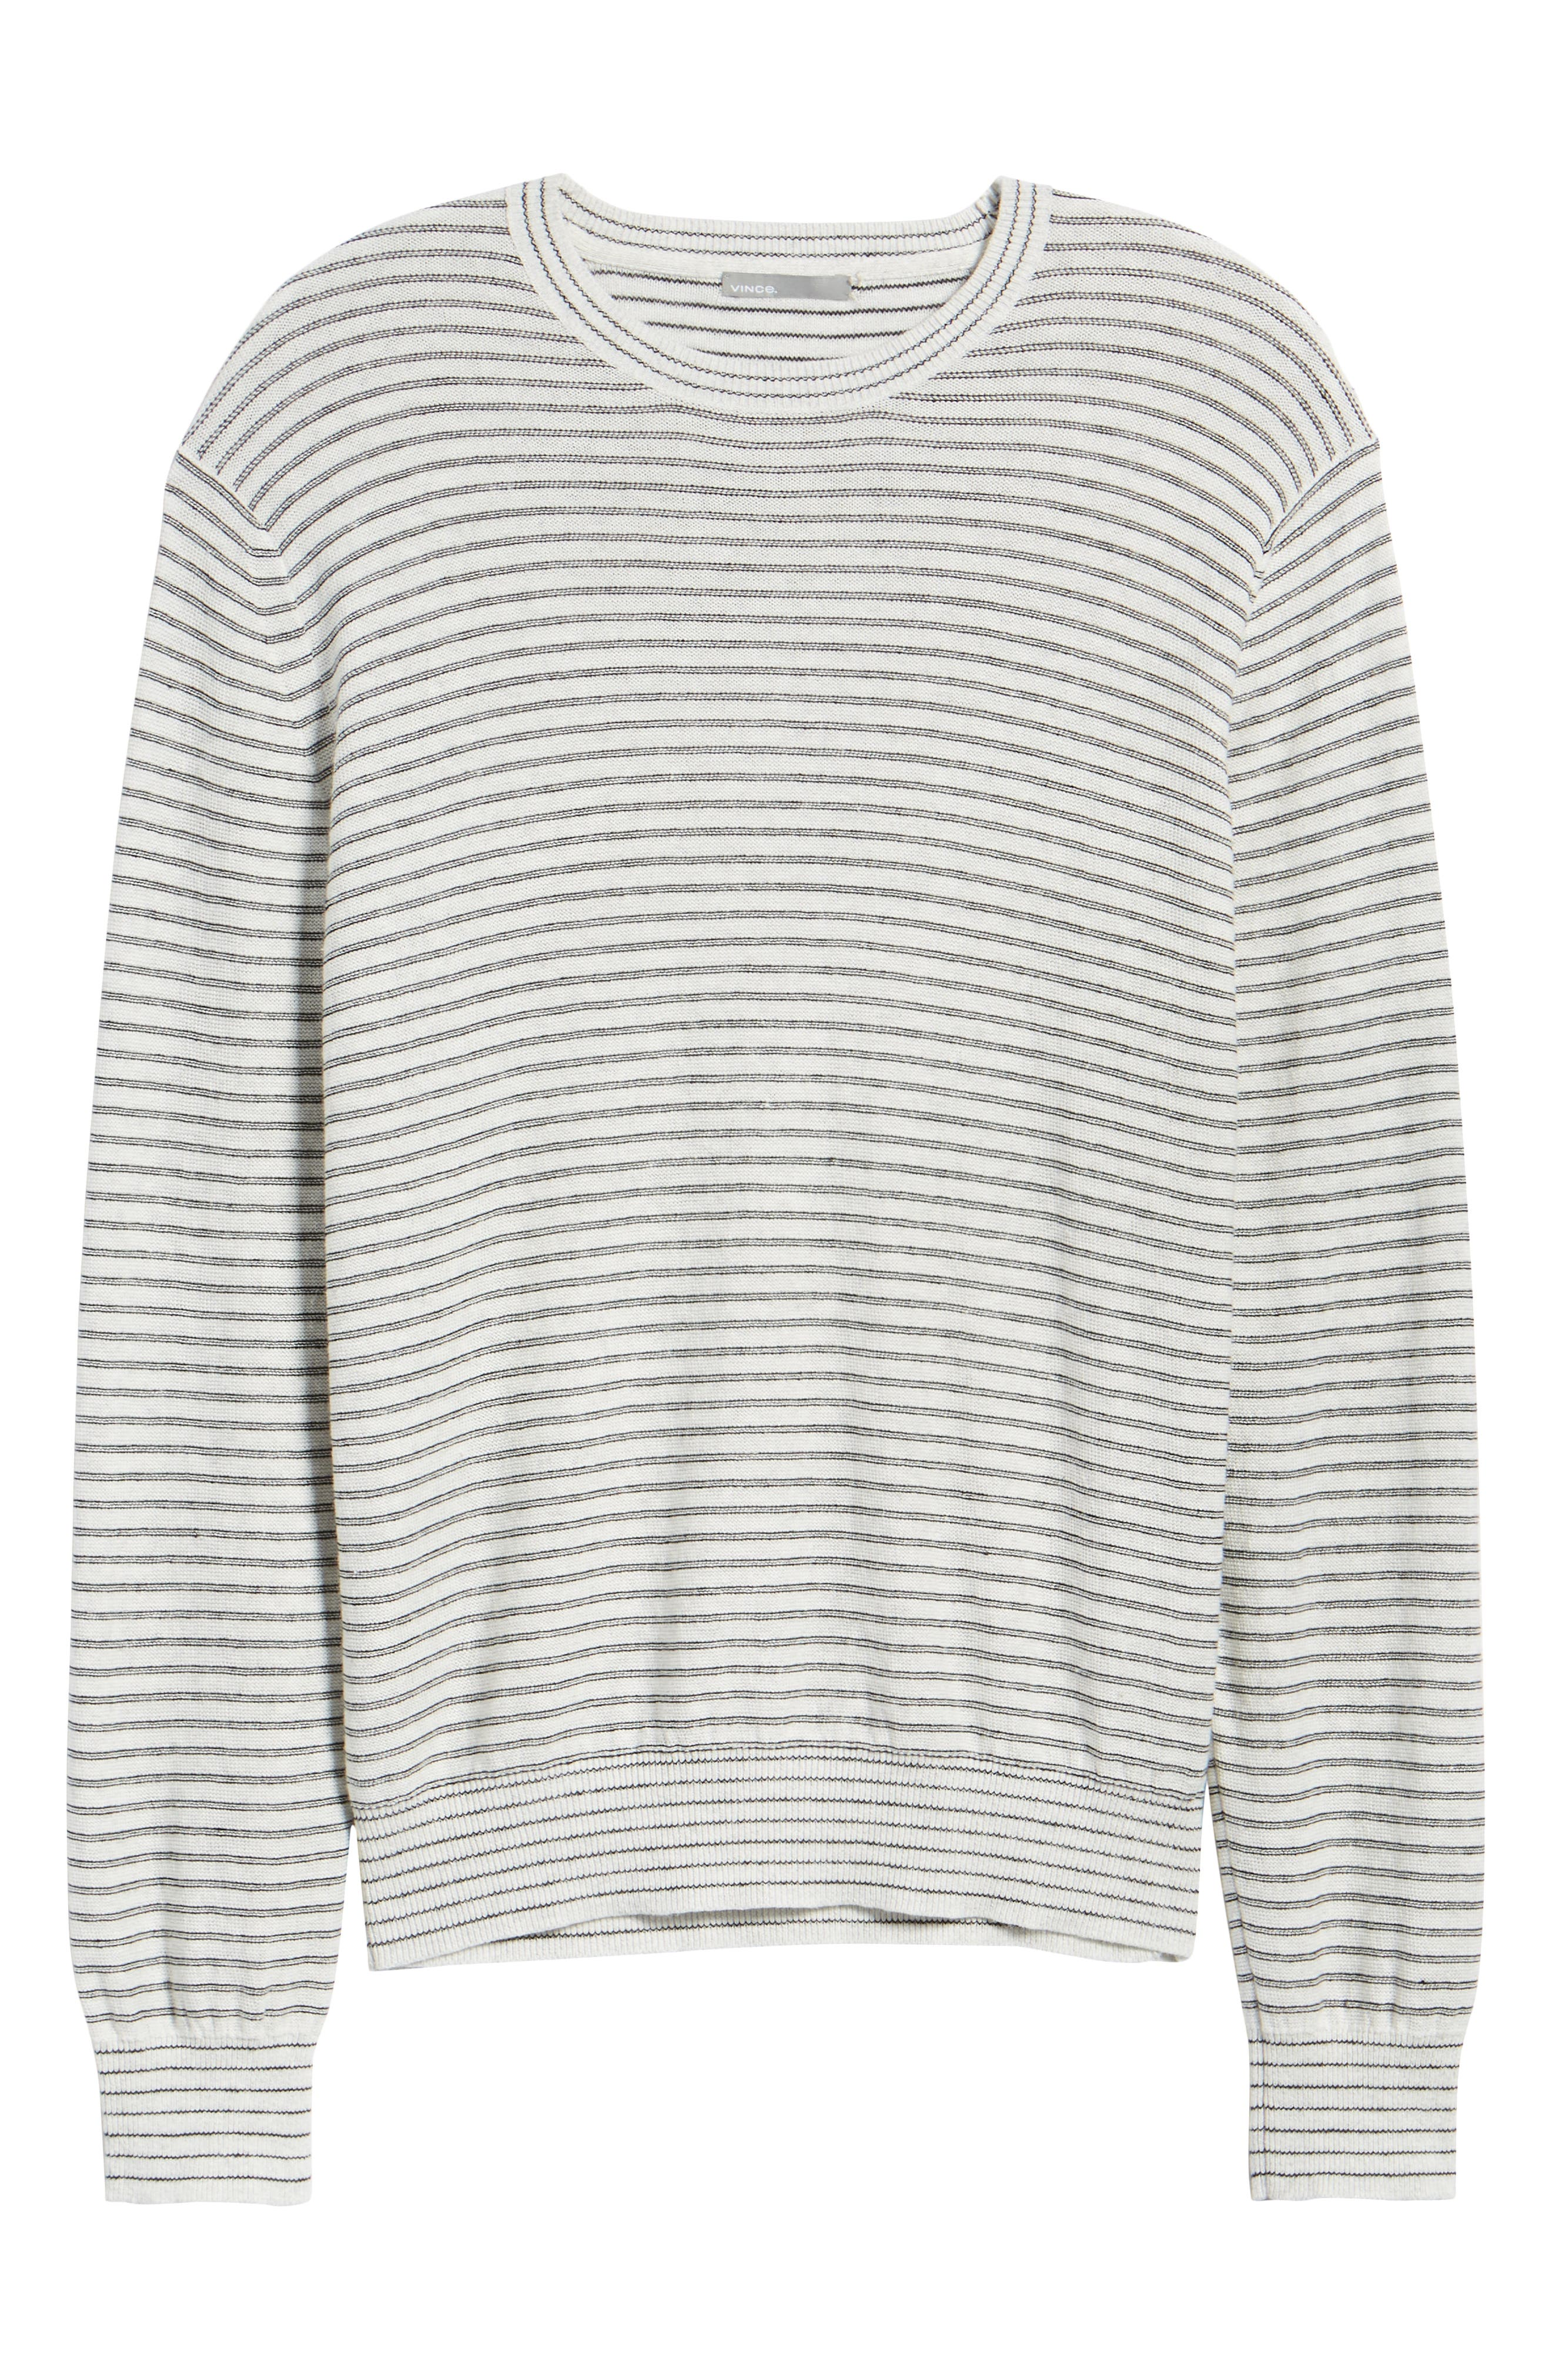 Stripe Long Sleeve Shirt,                             Alternate thumbnail 6, color,                             H WHITE/ BLACK